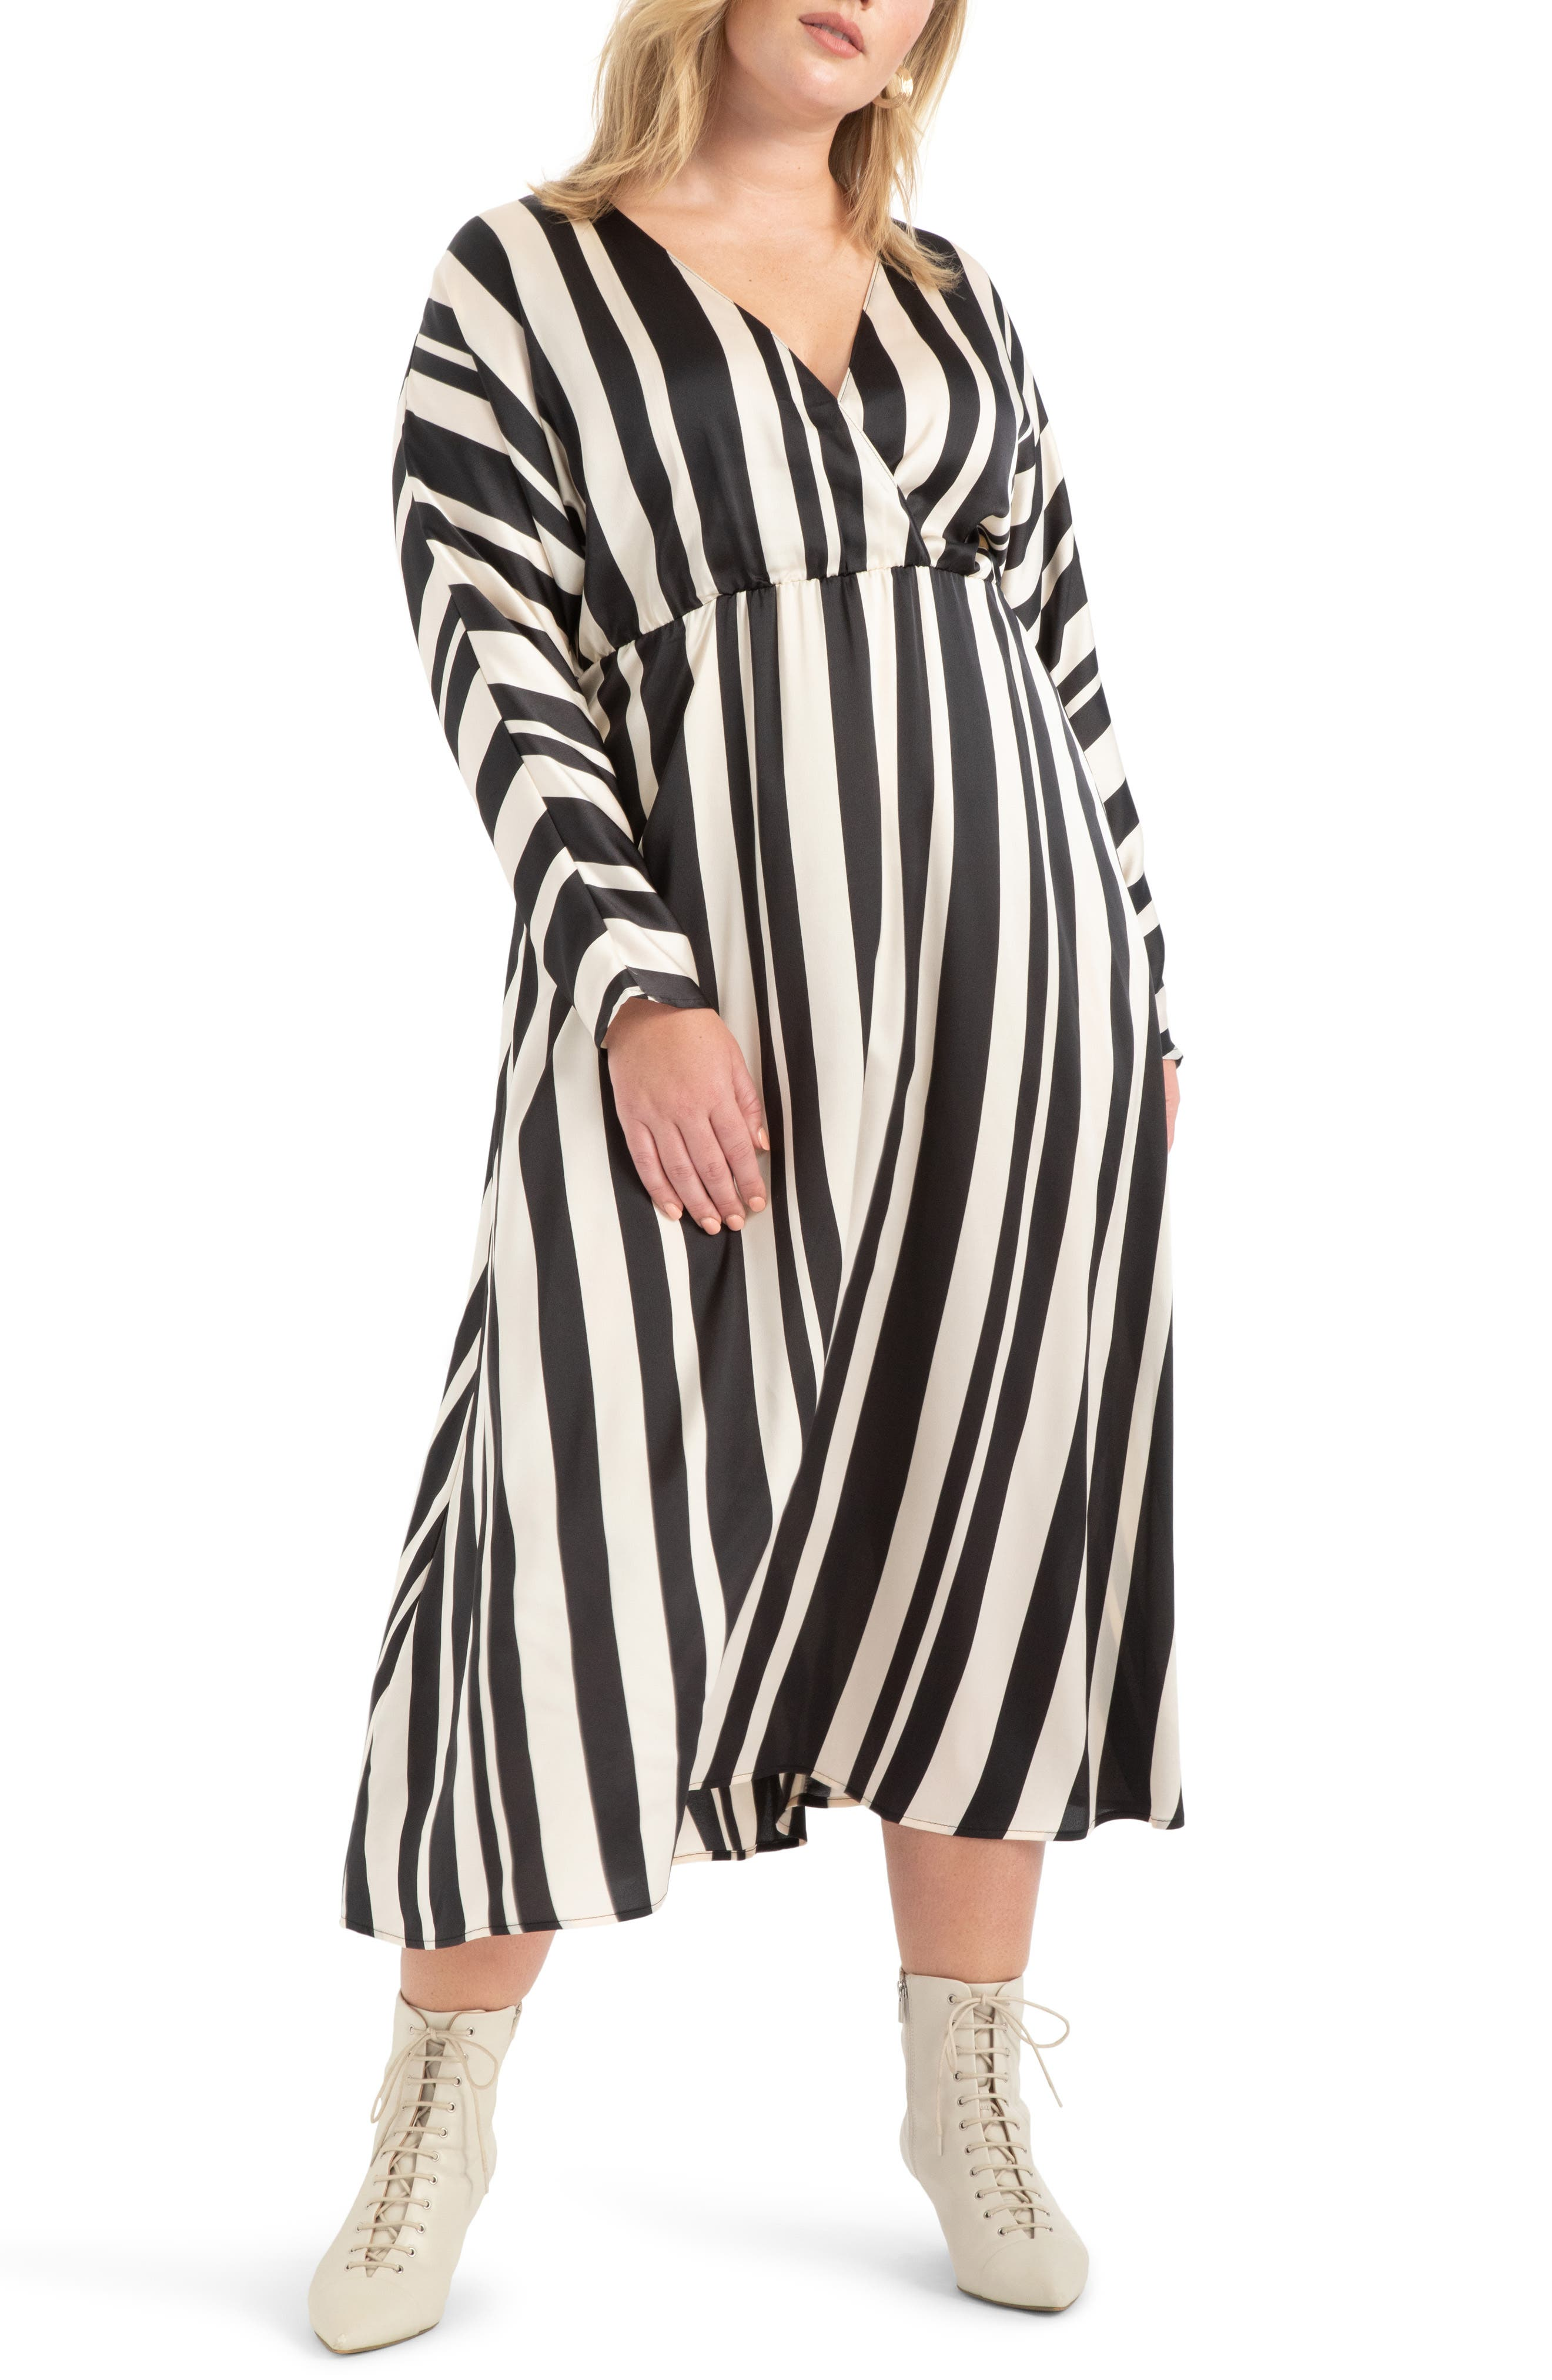 70s Dresses – Disco Dress, Hippie Dress, Wrap Dress Plus Size Womens Eloquii Stripe Maxi Dress Size 26W - Black $119.95 AT vintagedancer.com